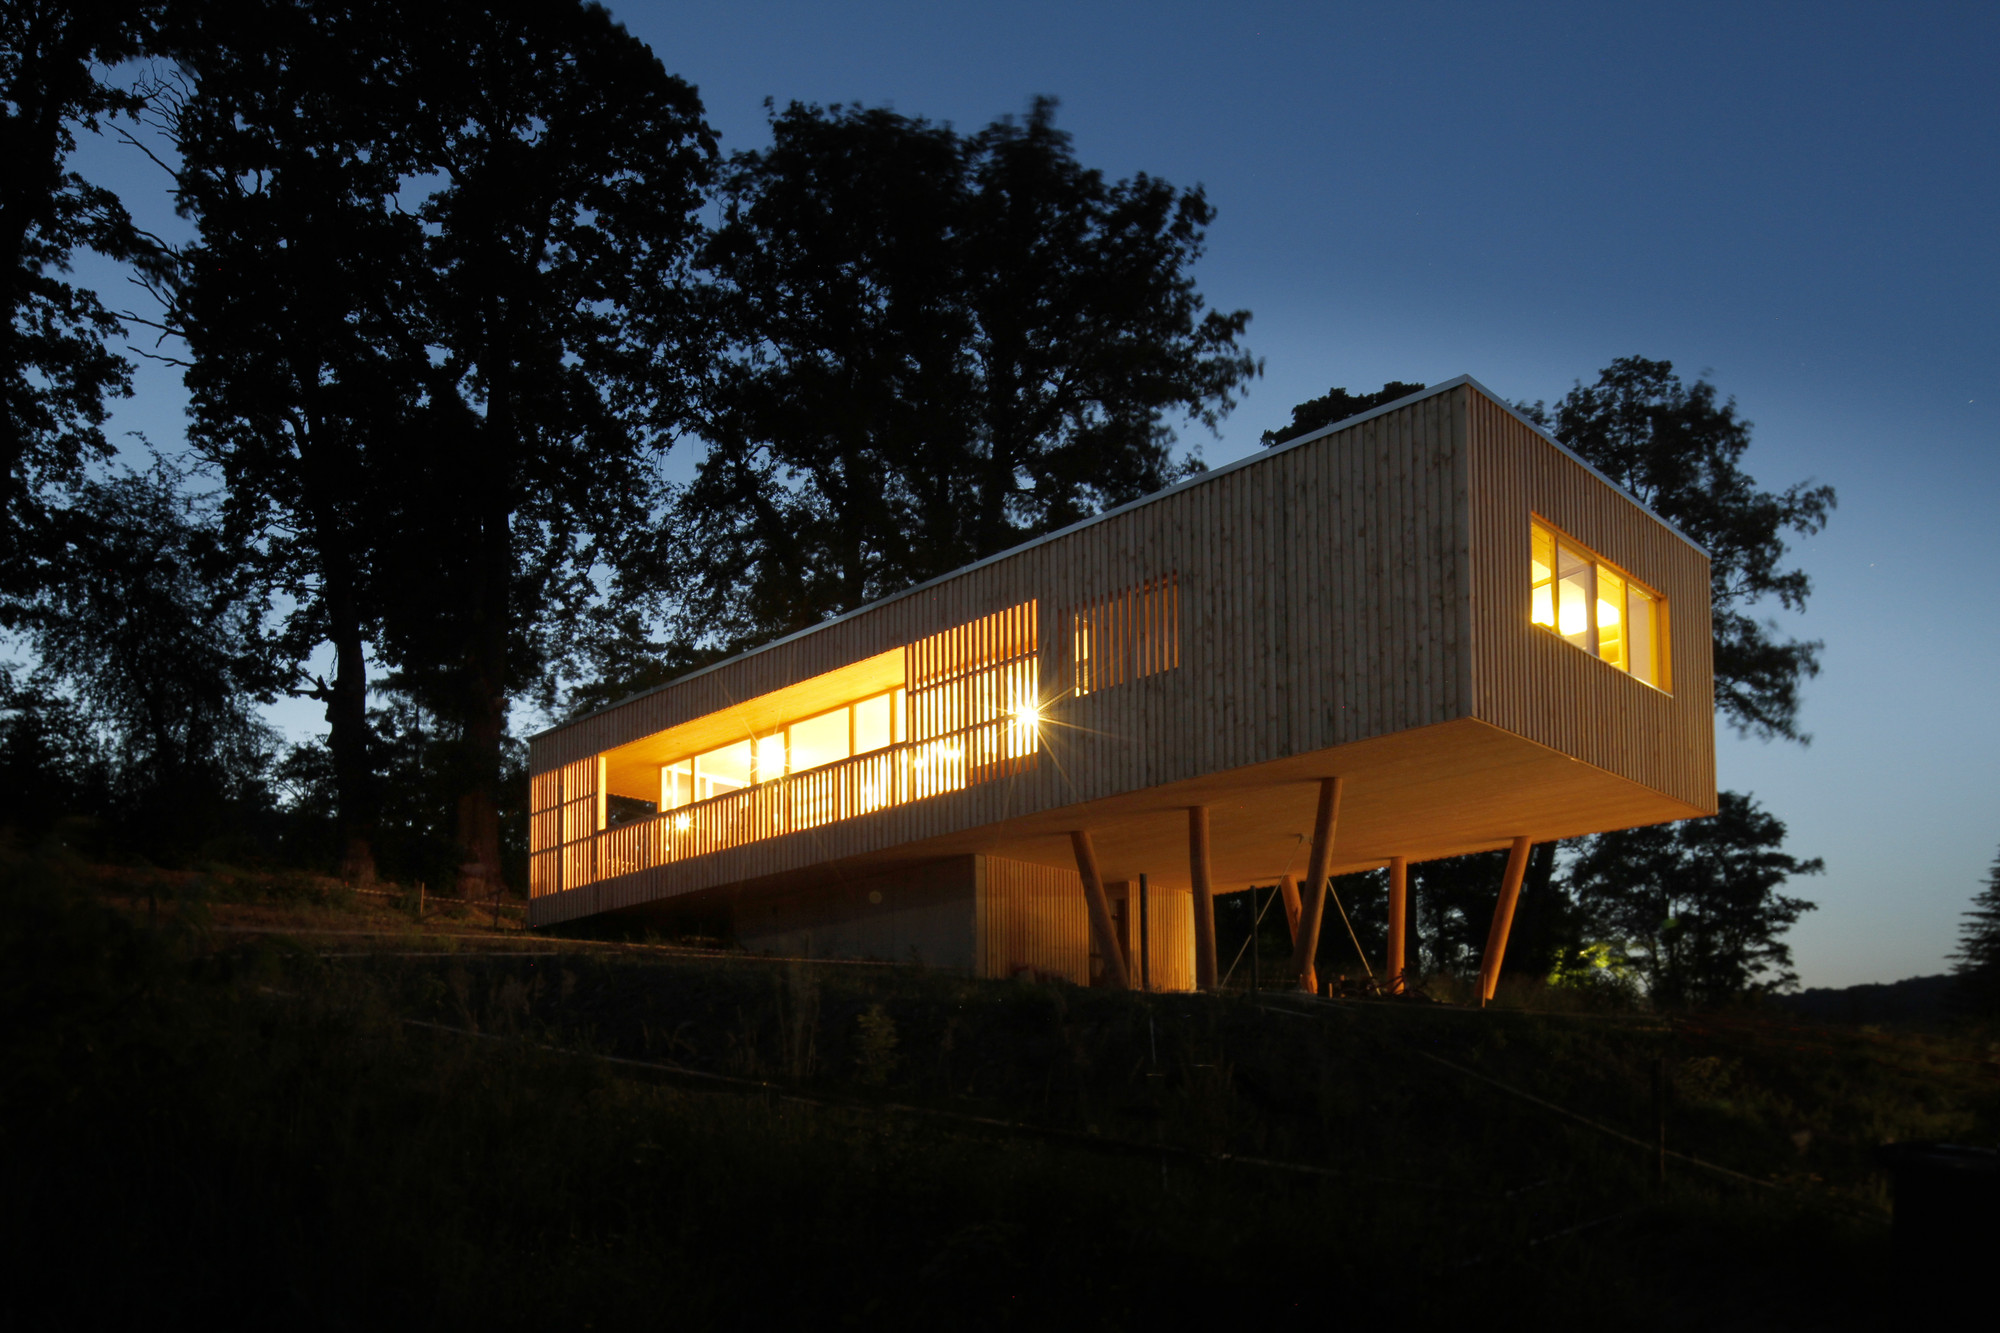 House under the Oaks / Juri Troy Architects, Courtesy of Juri Troy Architects